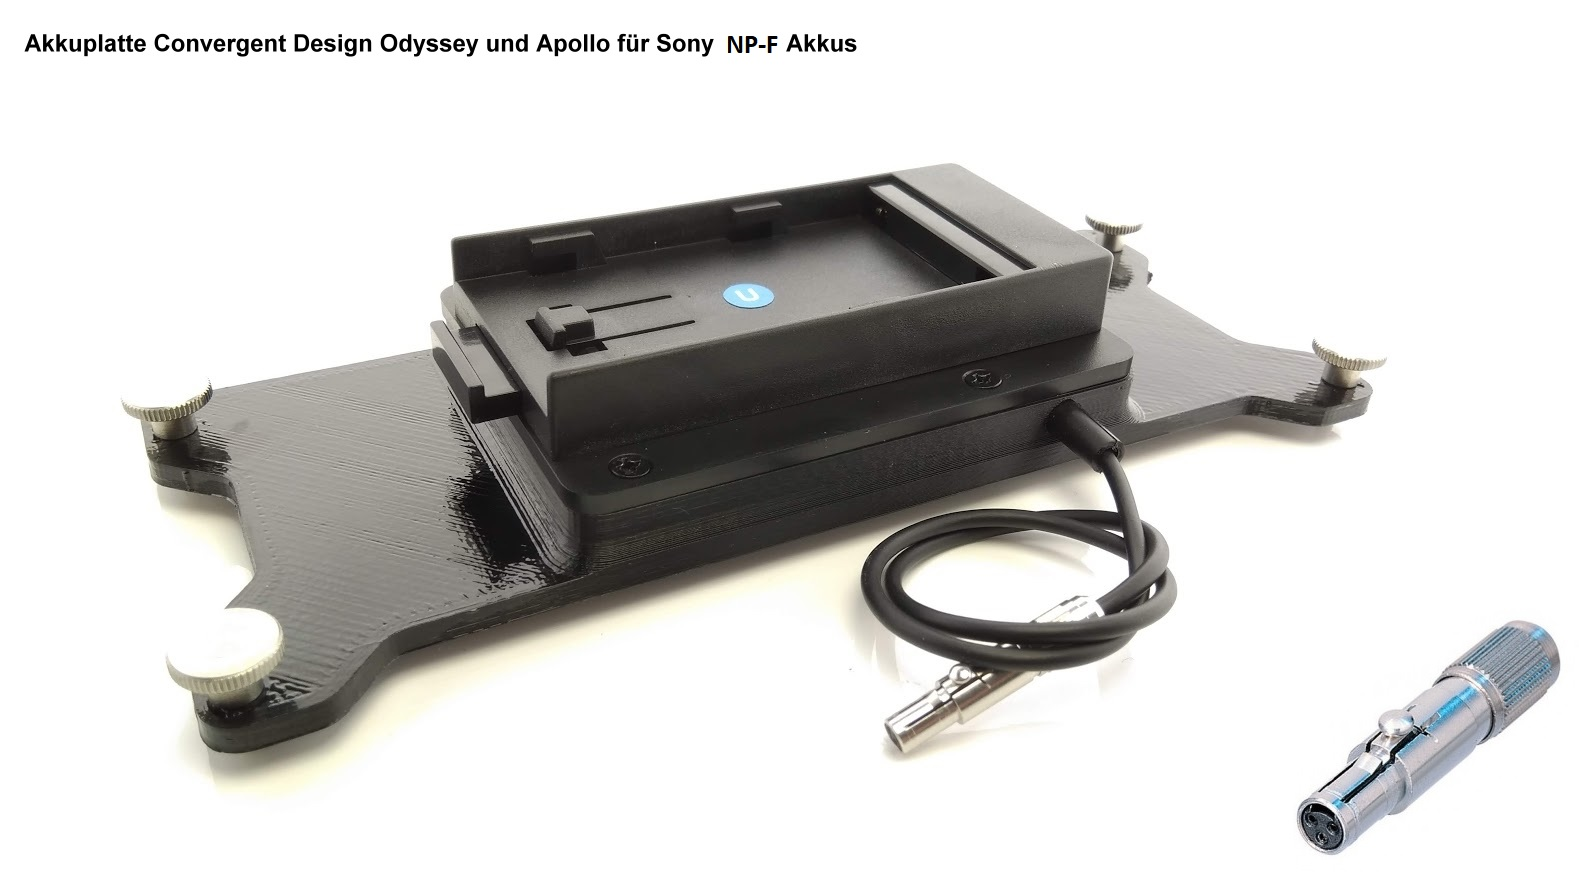 Artikelfoto 1 FineVideo Sony NP-F Akkuplatte passend zu Convergent Odyssey Apollo CD-OD-SL